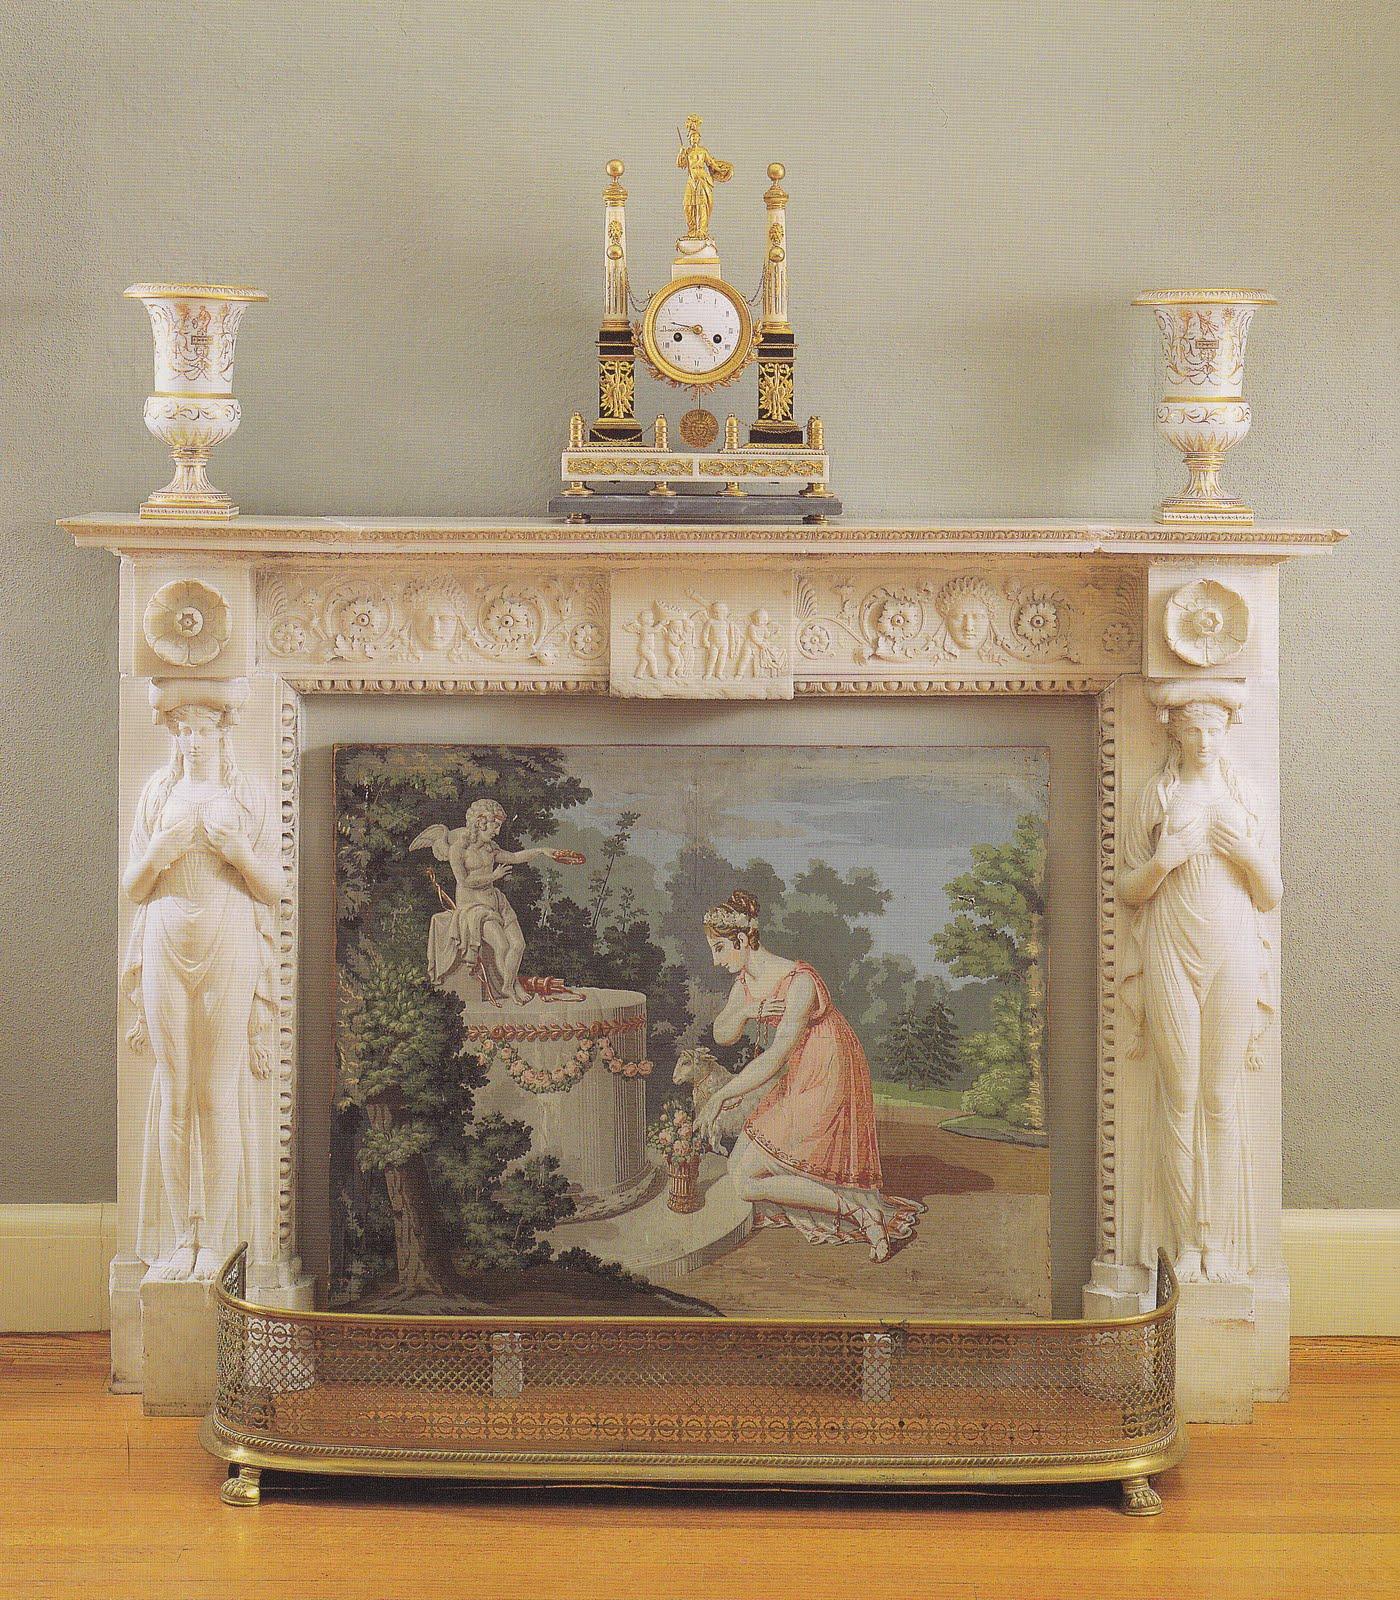 reggie darling the fireboards of darlington house